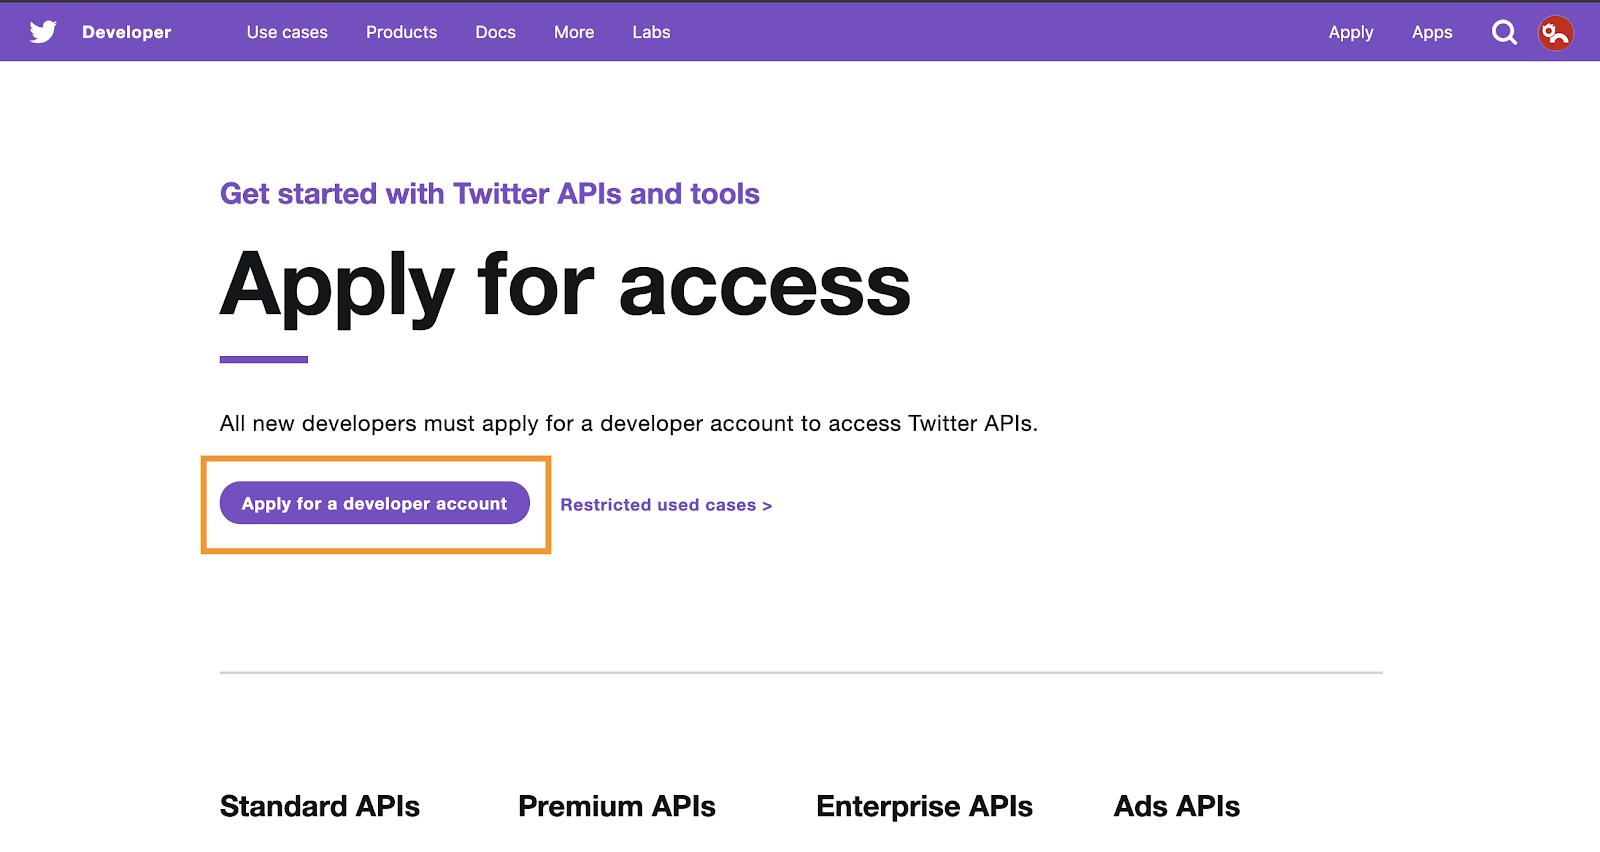 Click 'Apply for a developer account' button